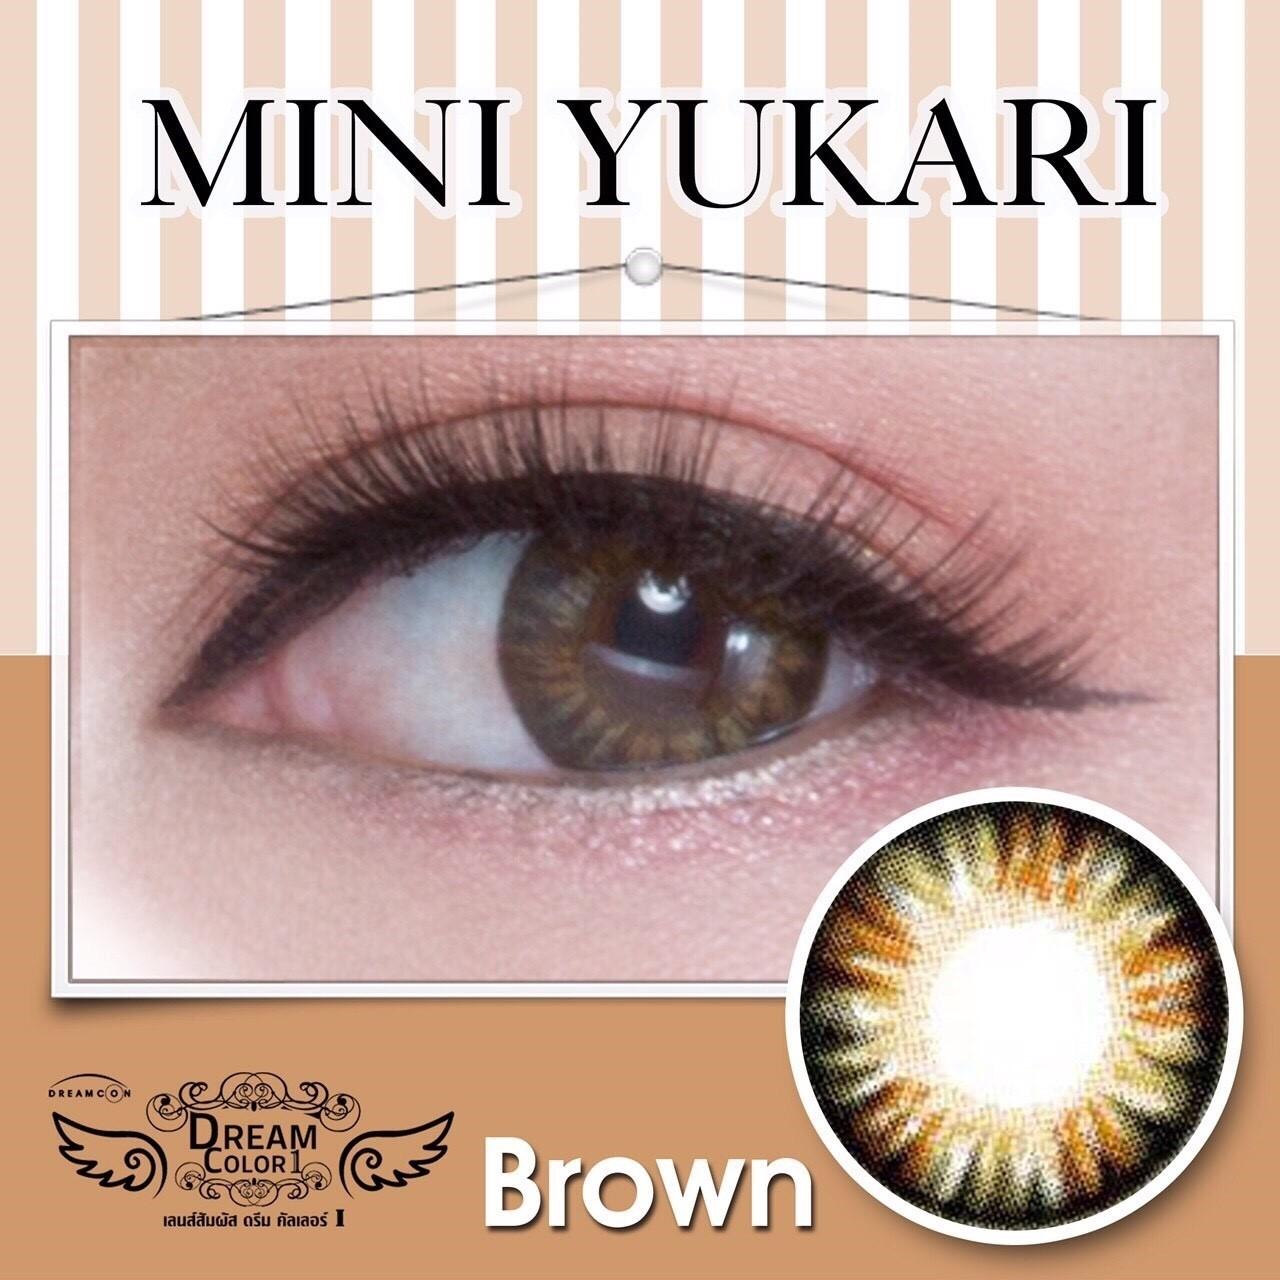 Mini Yukari brwon คอนแทคเลนส์ Dreamcolor1